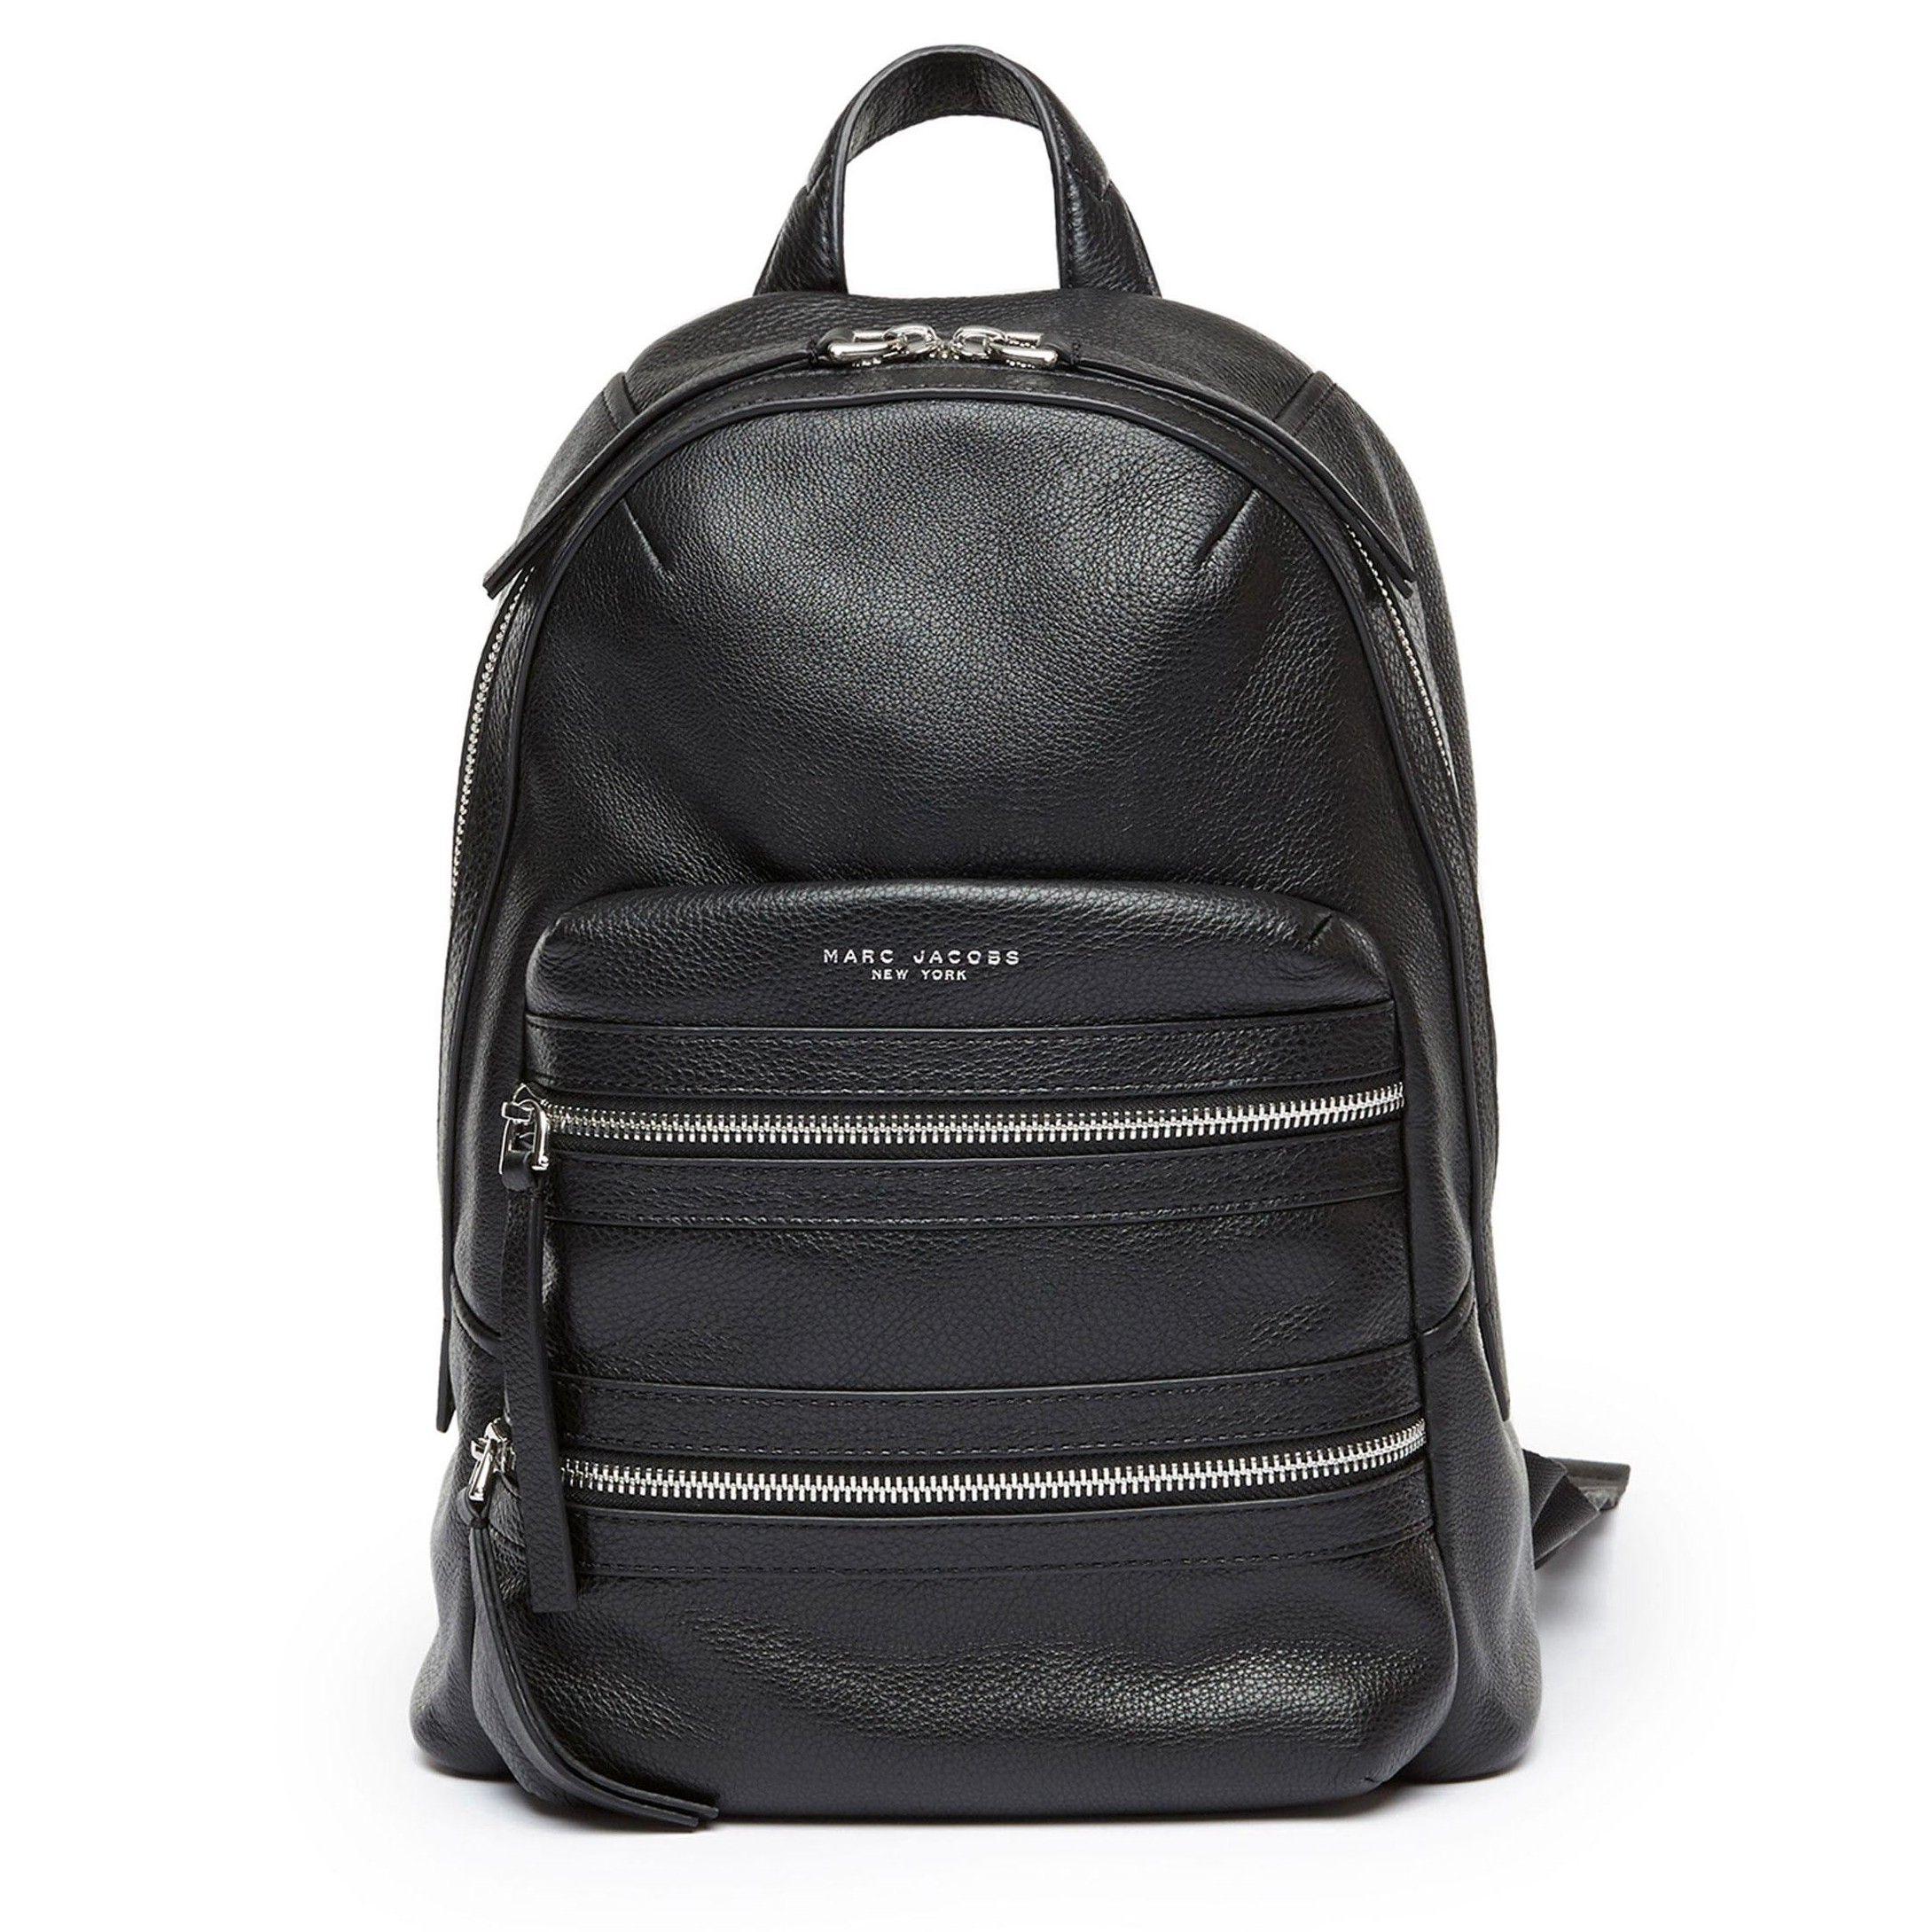 a9324da925 MARC JACOBS Biker Large Leather Backpack.  marcjacobs  bags  leather   backpacks